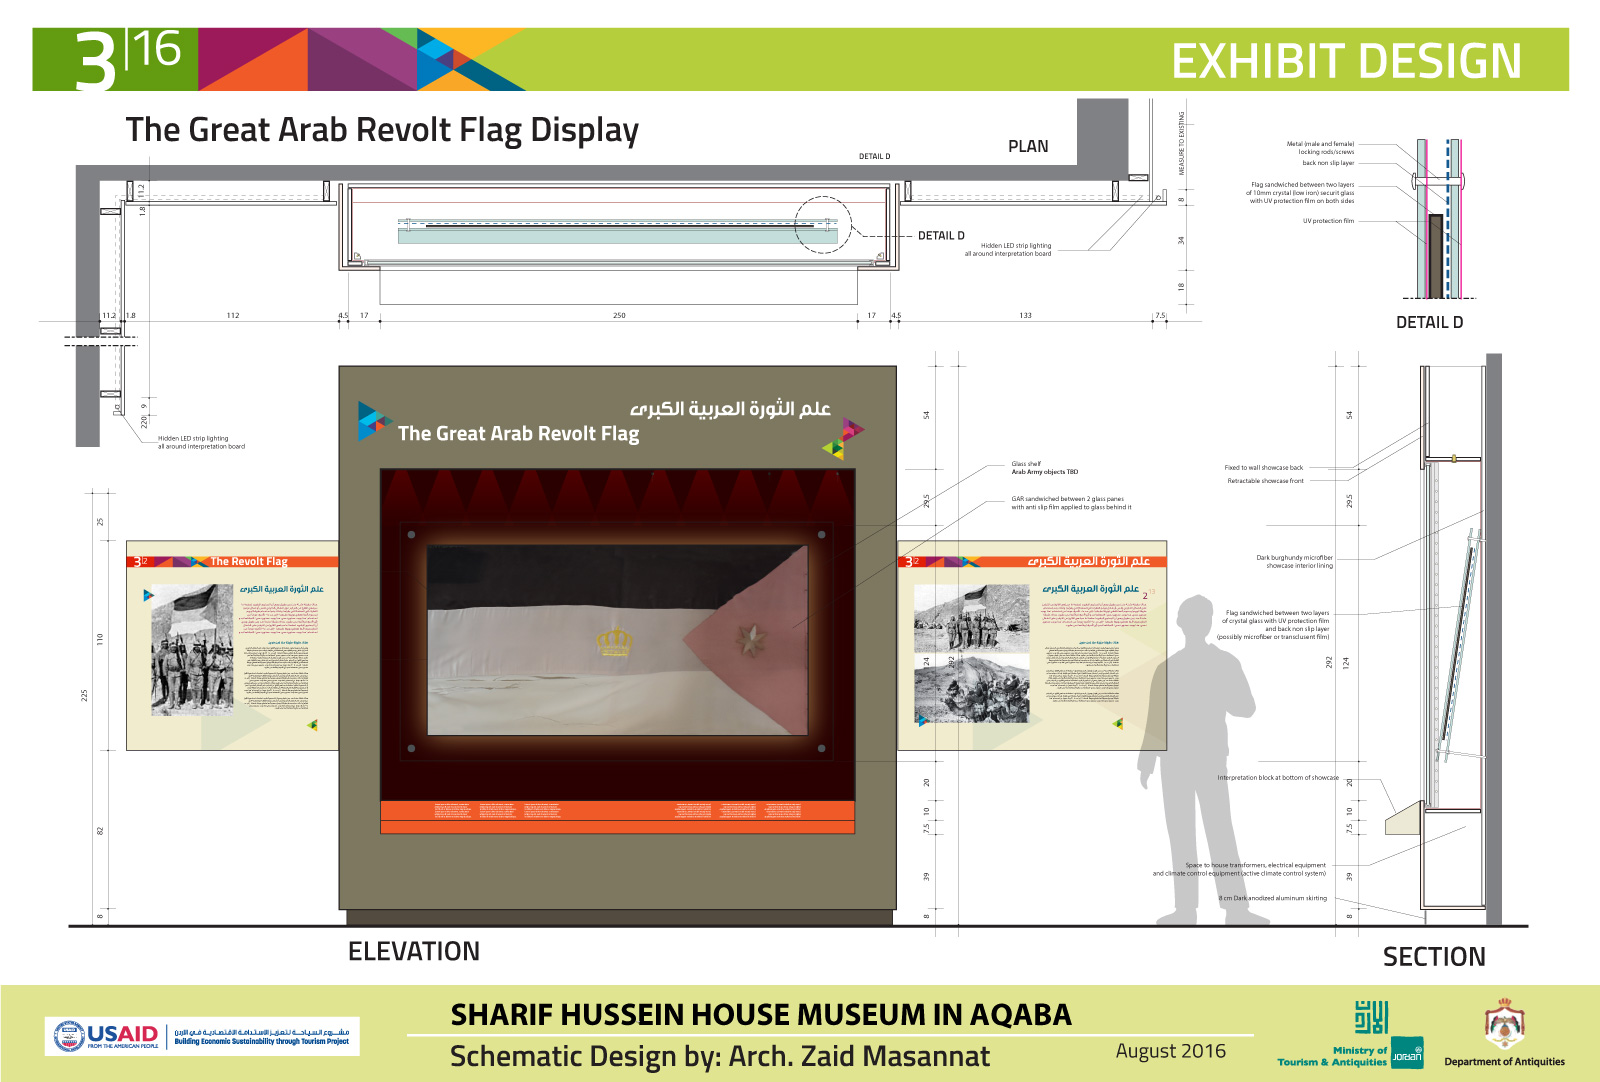 Sharif Hussein Museum in Aqaba